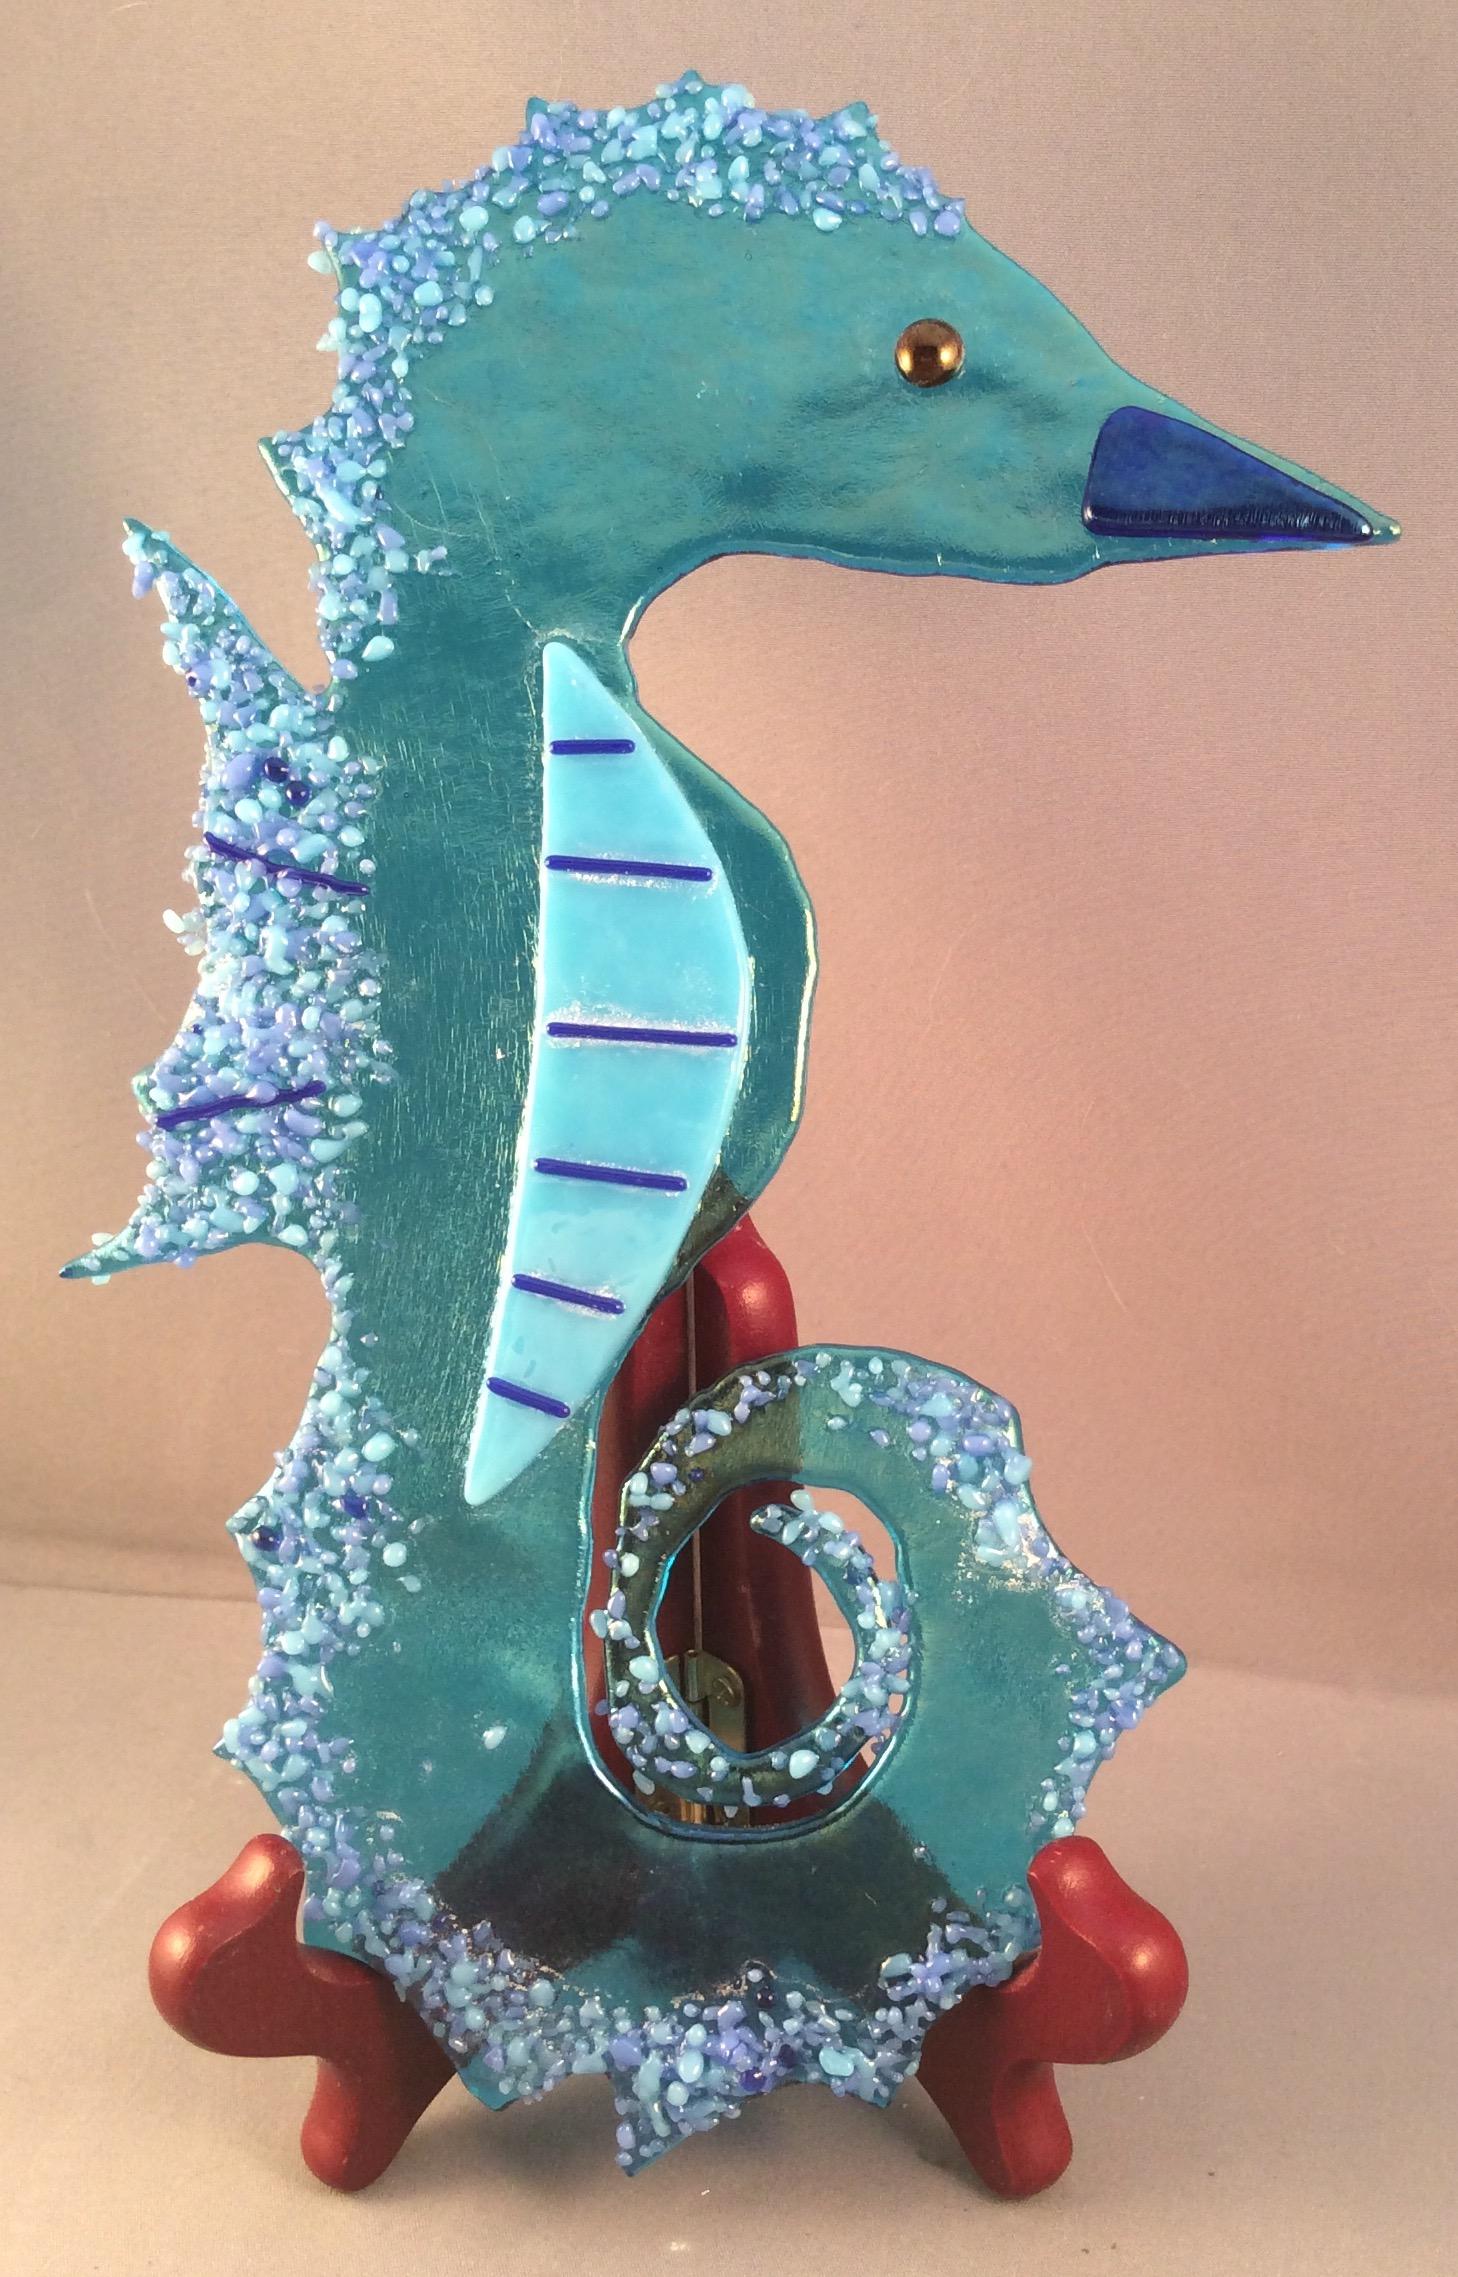 Seahorse IMG_5798